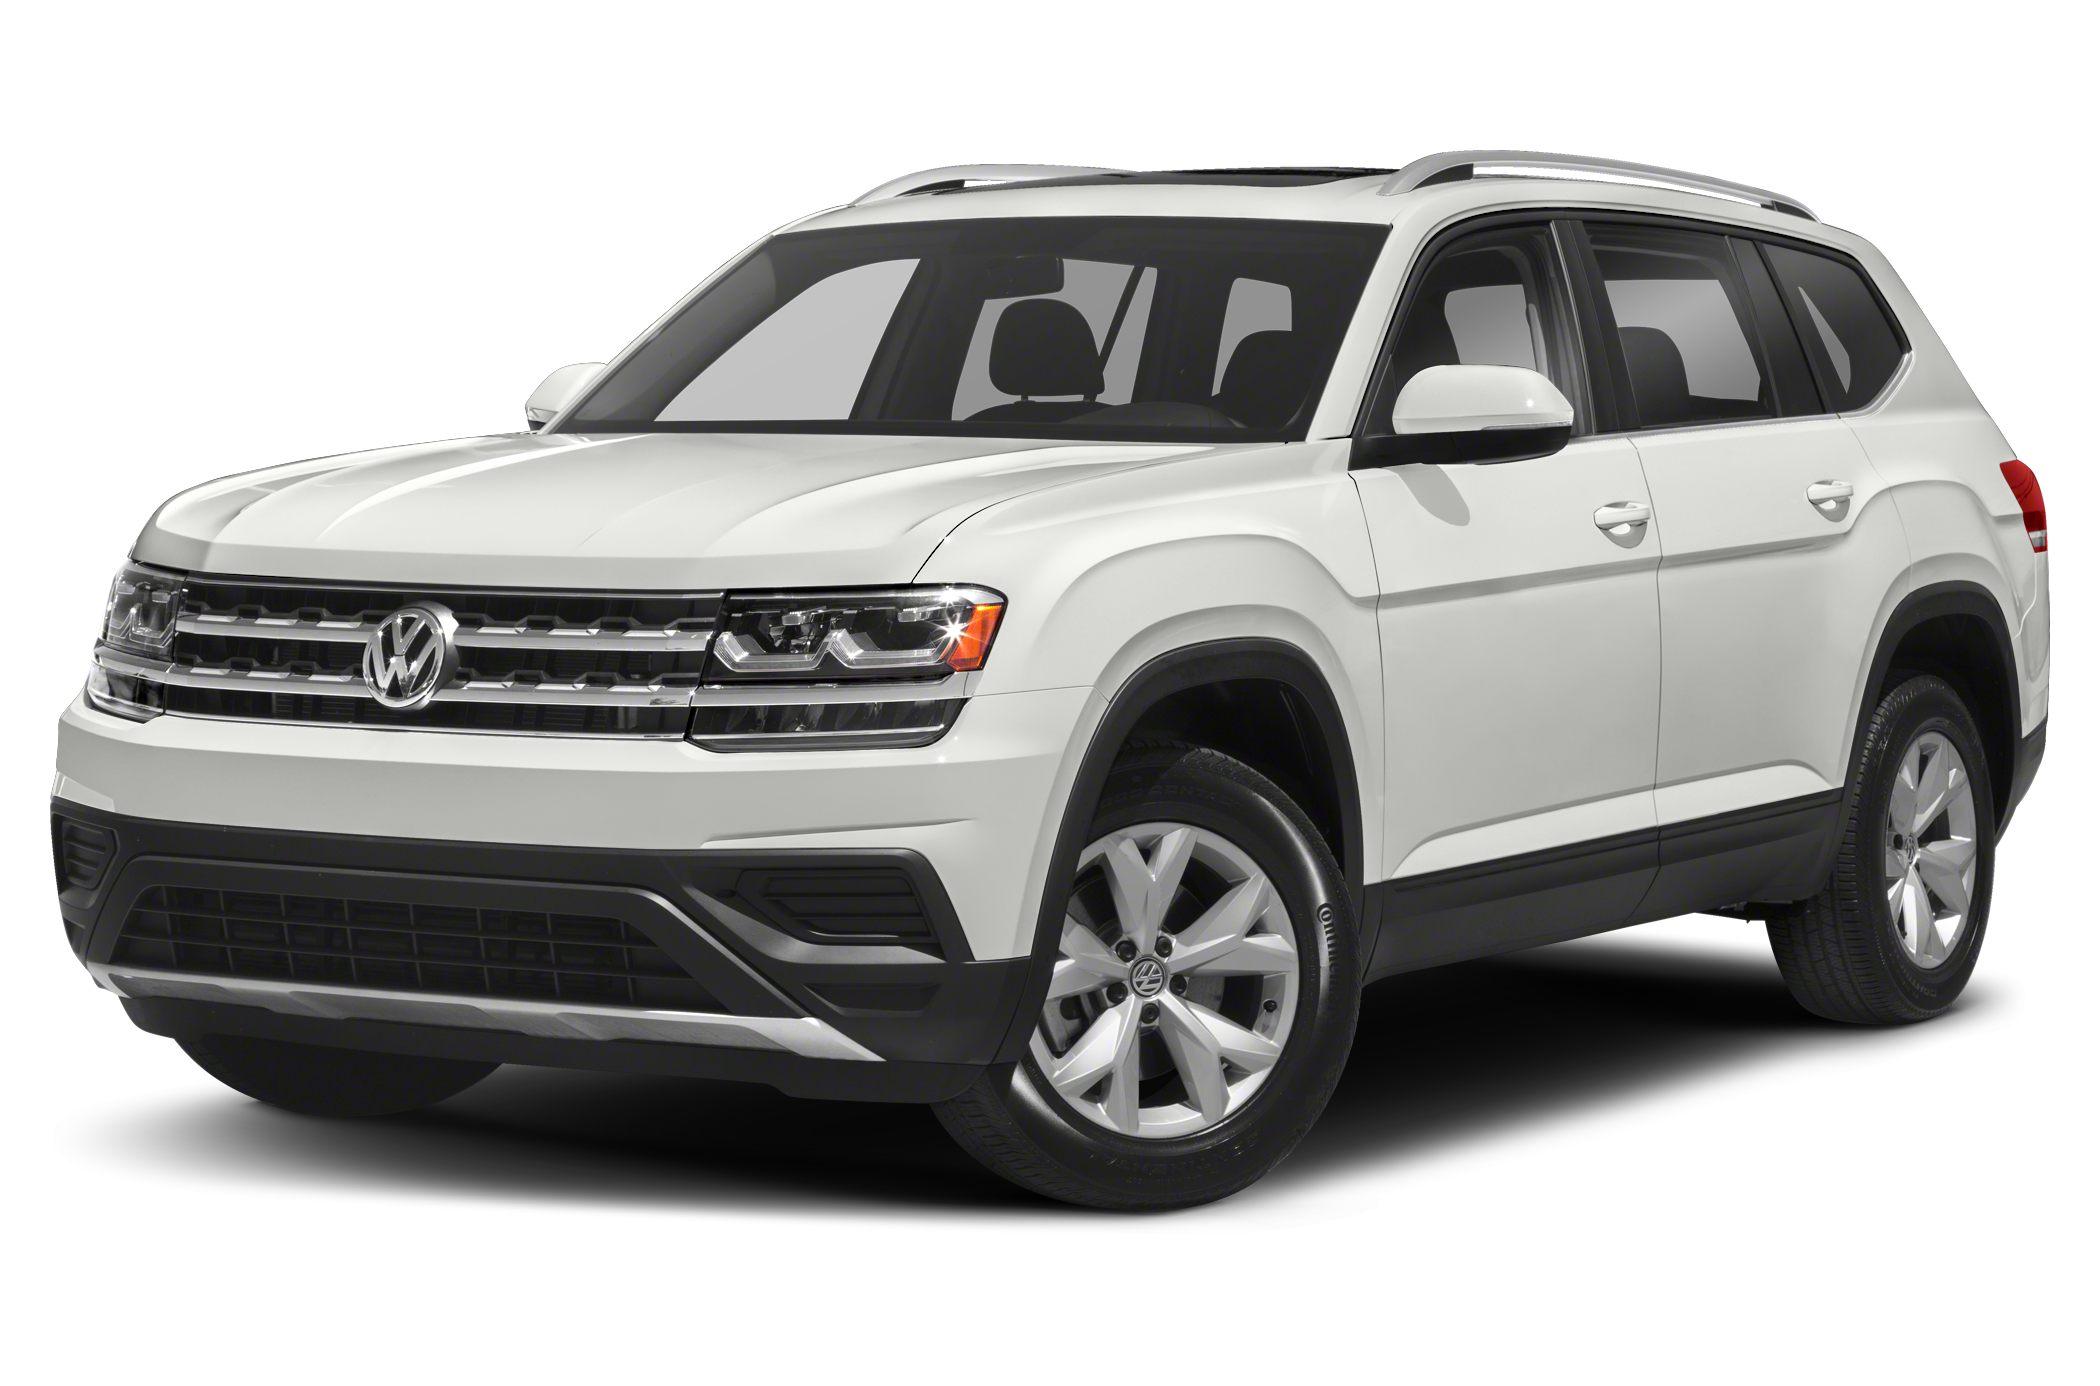 2020 Volkswagen Atlas 3.6L V6 SE 4dr All-wheel Drive 4MOTION